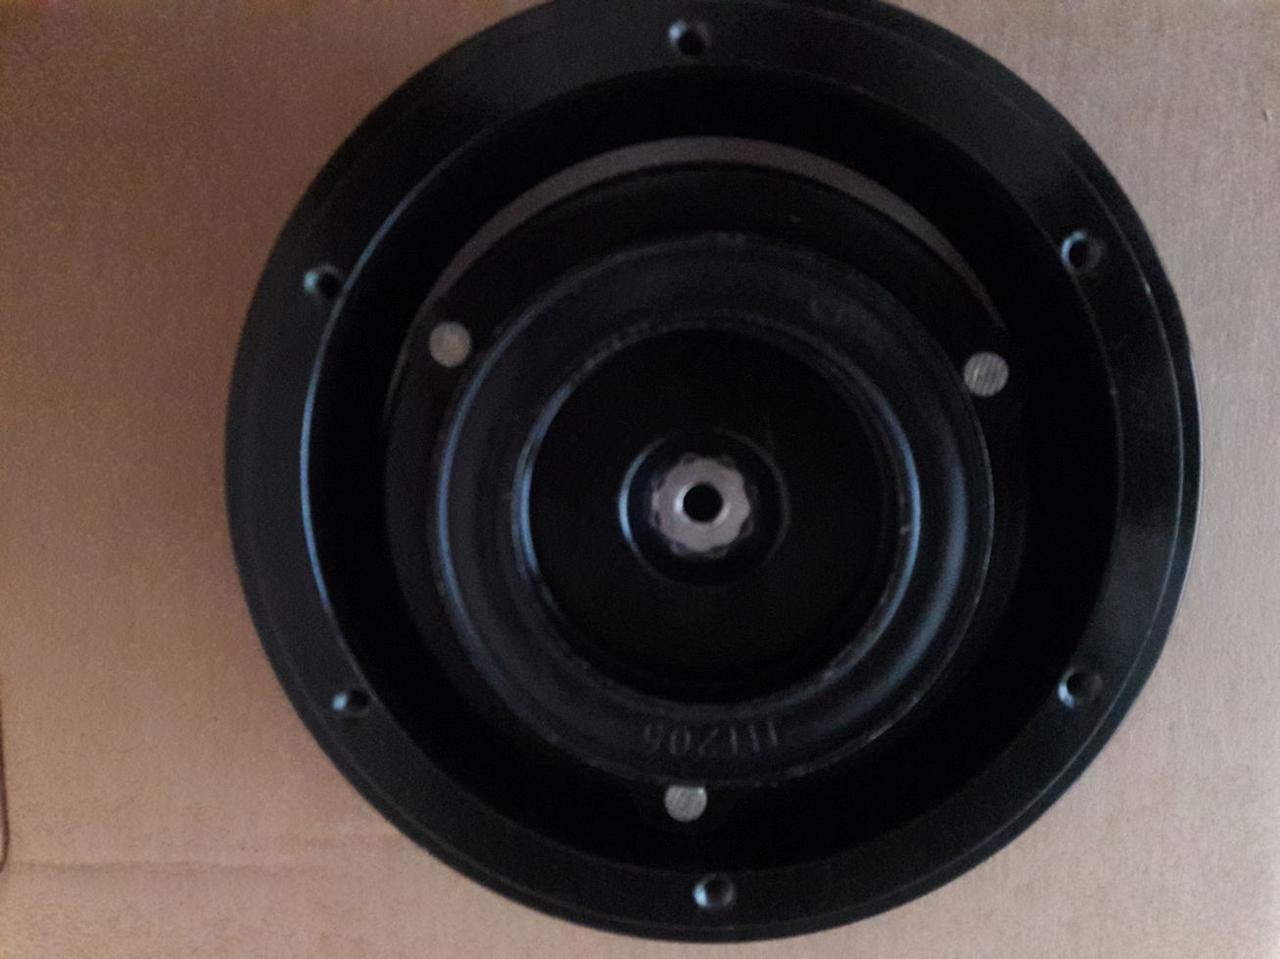 Шкив компрессора кондиционера DENSO 10 PA 15/17C 125mm/8pv